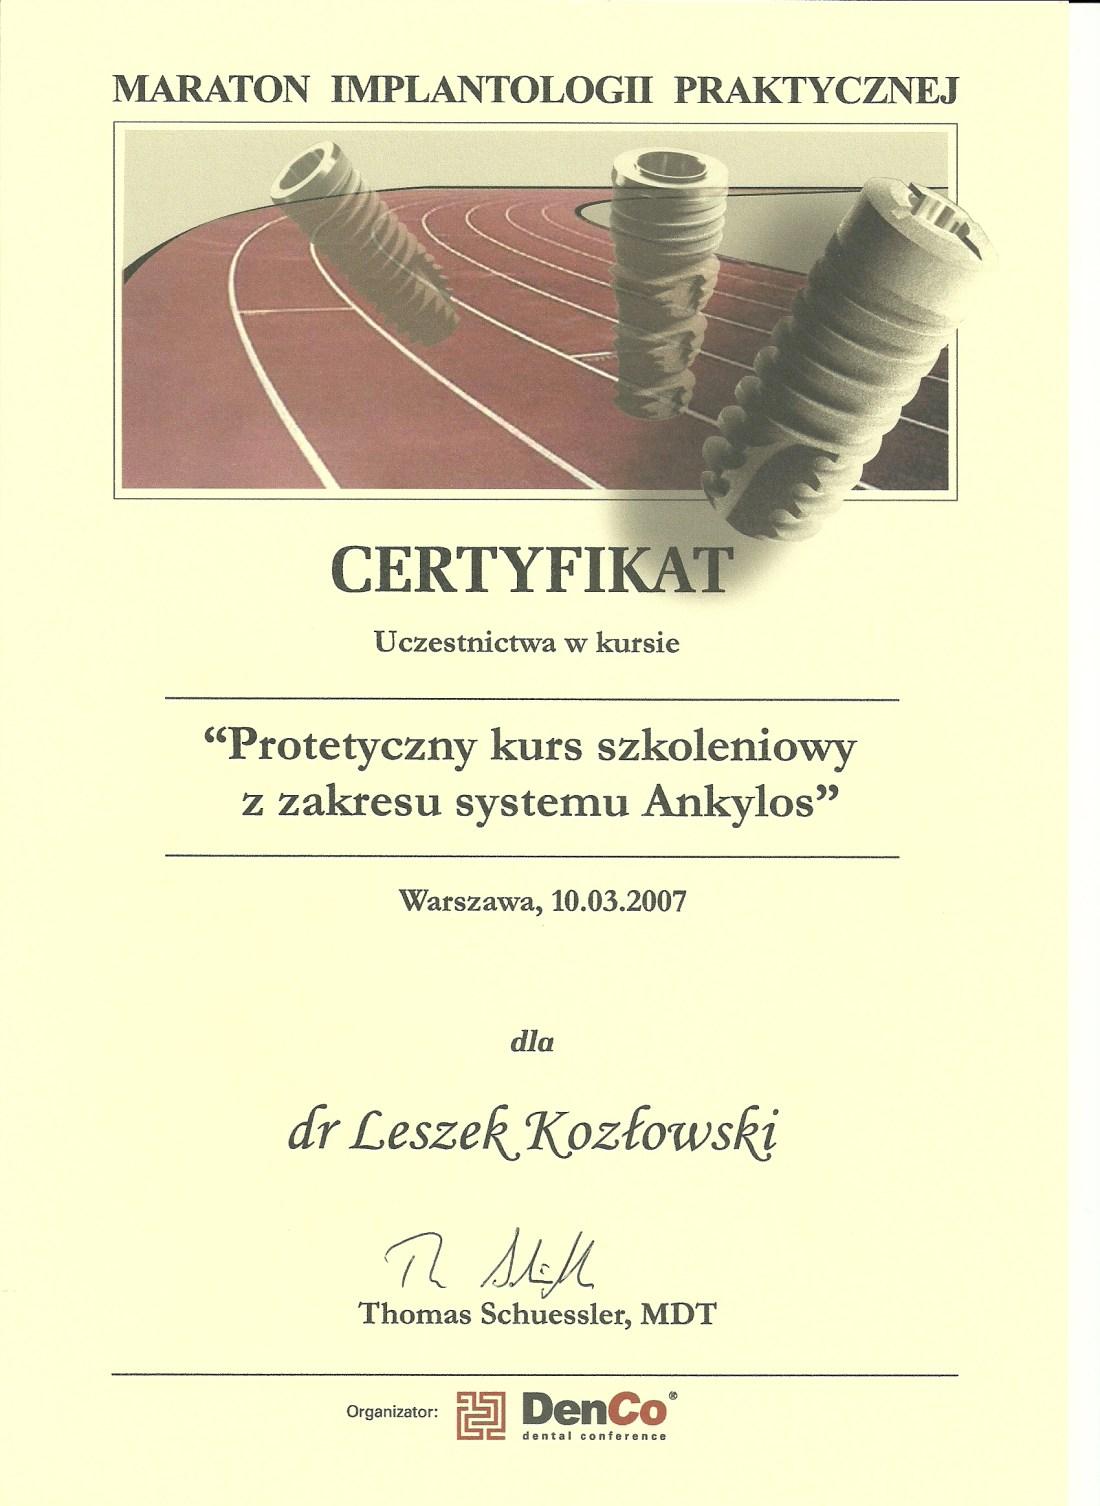 dentysta warszawa DENTYSTA WARSZAWA – DENTOKLINIKA Dentysta warszawa Leszek Kozlowski Certyfikat 14